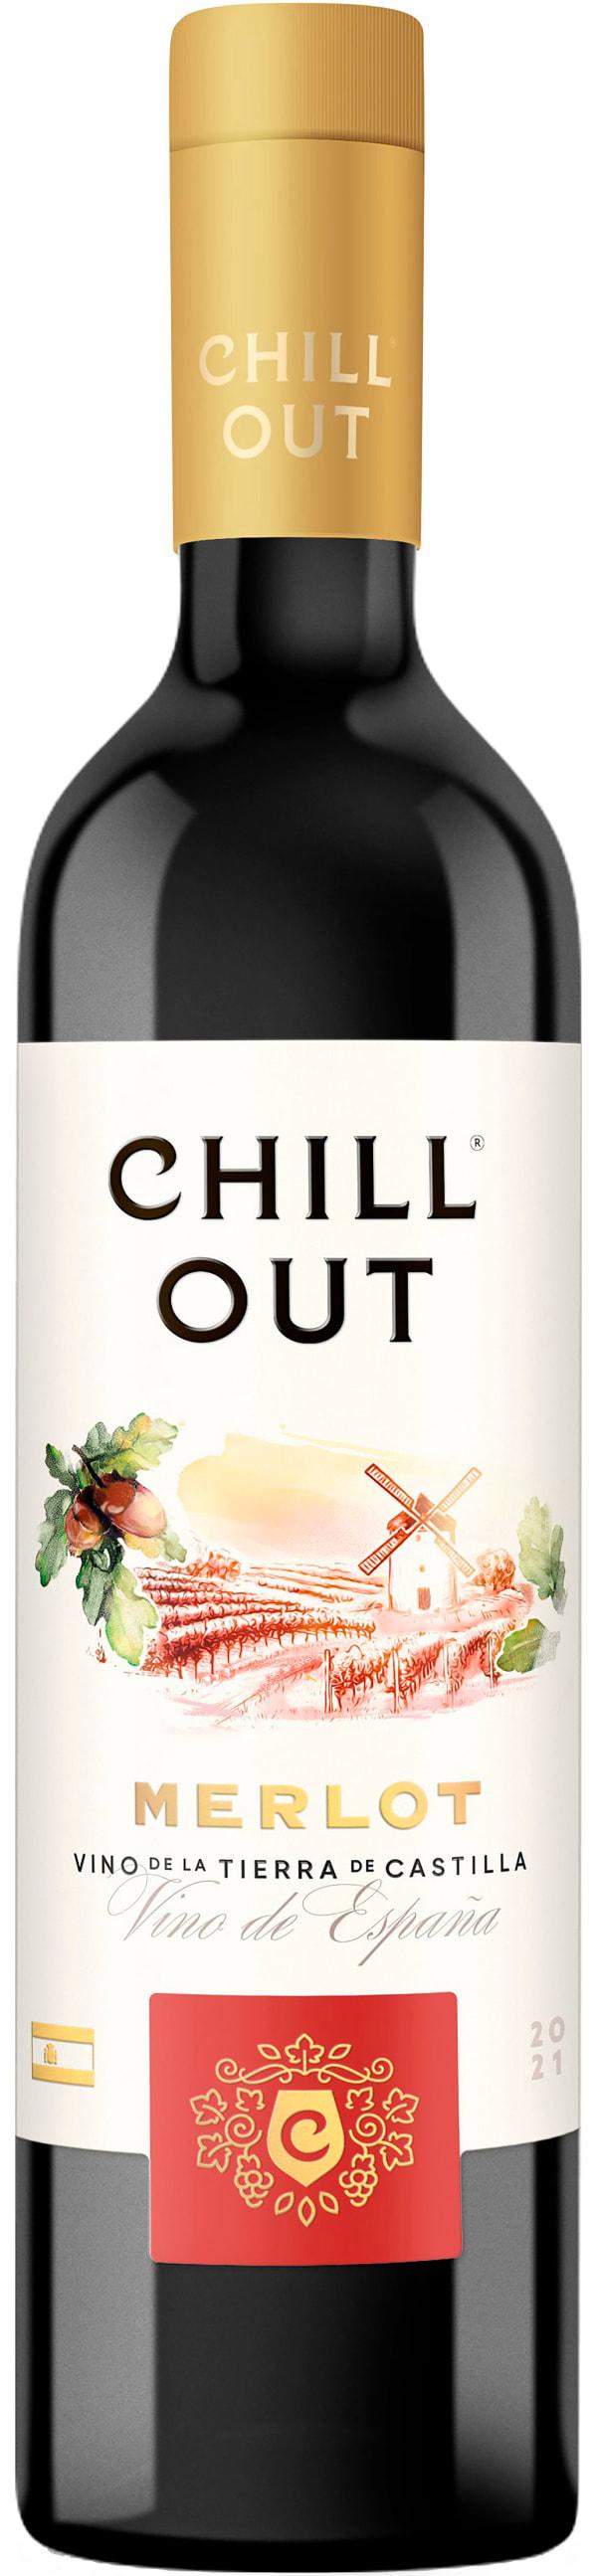 Chill Out Merlot Spain  2017 plastflaska